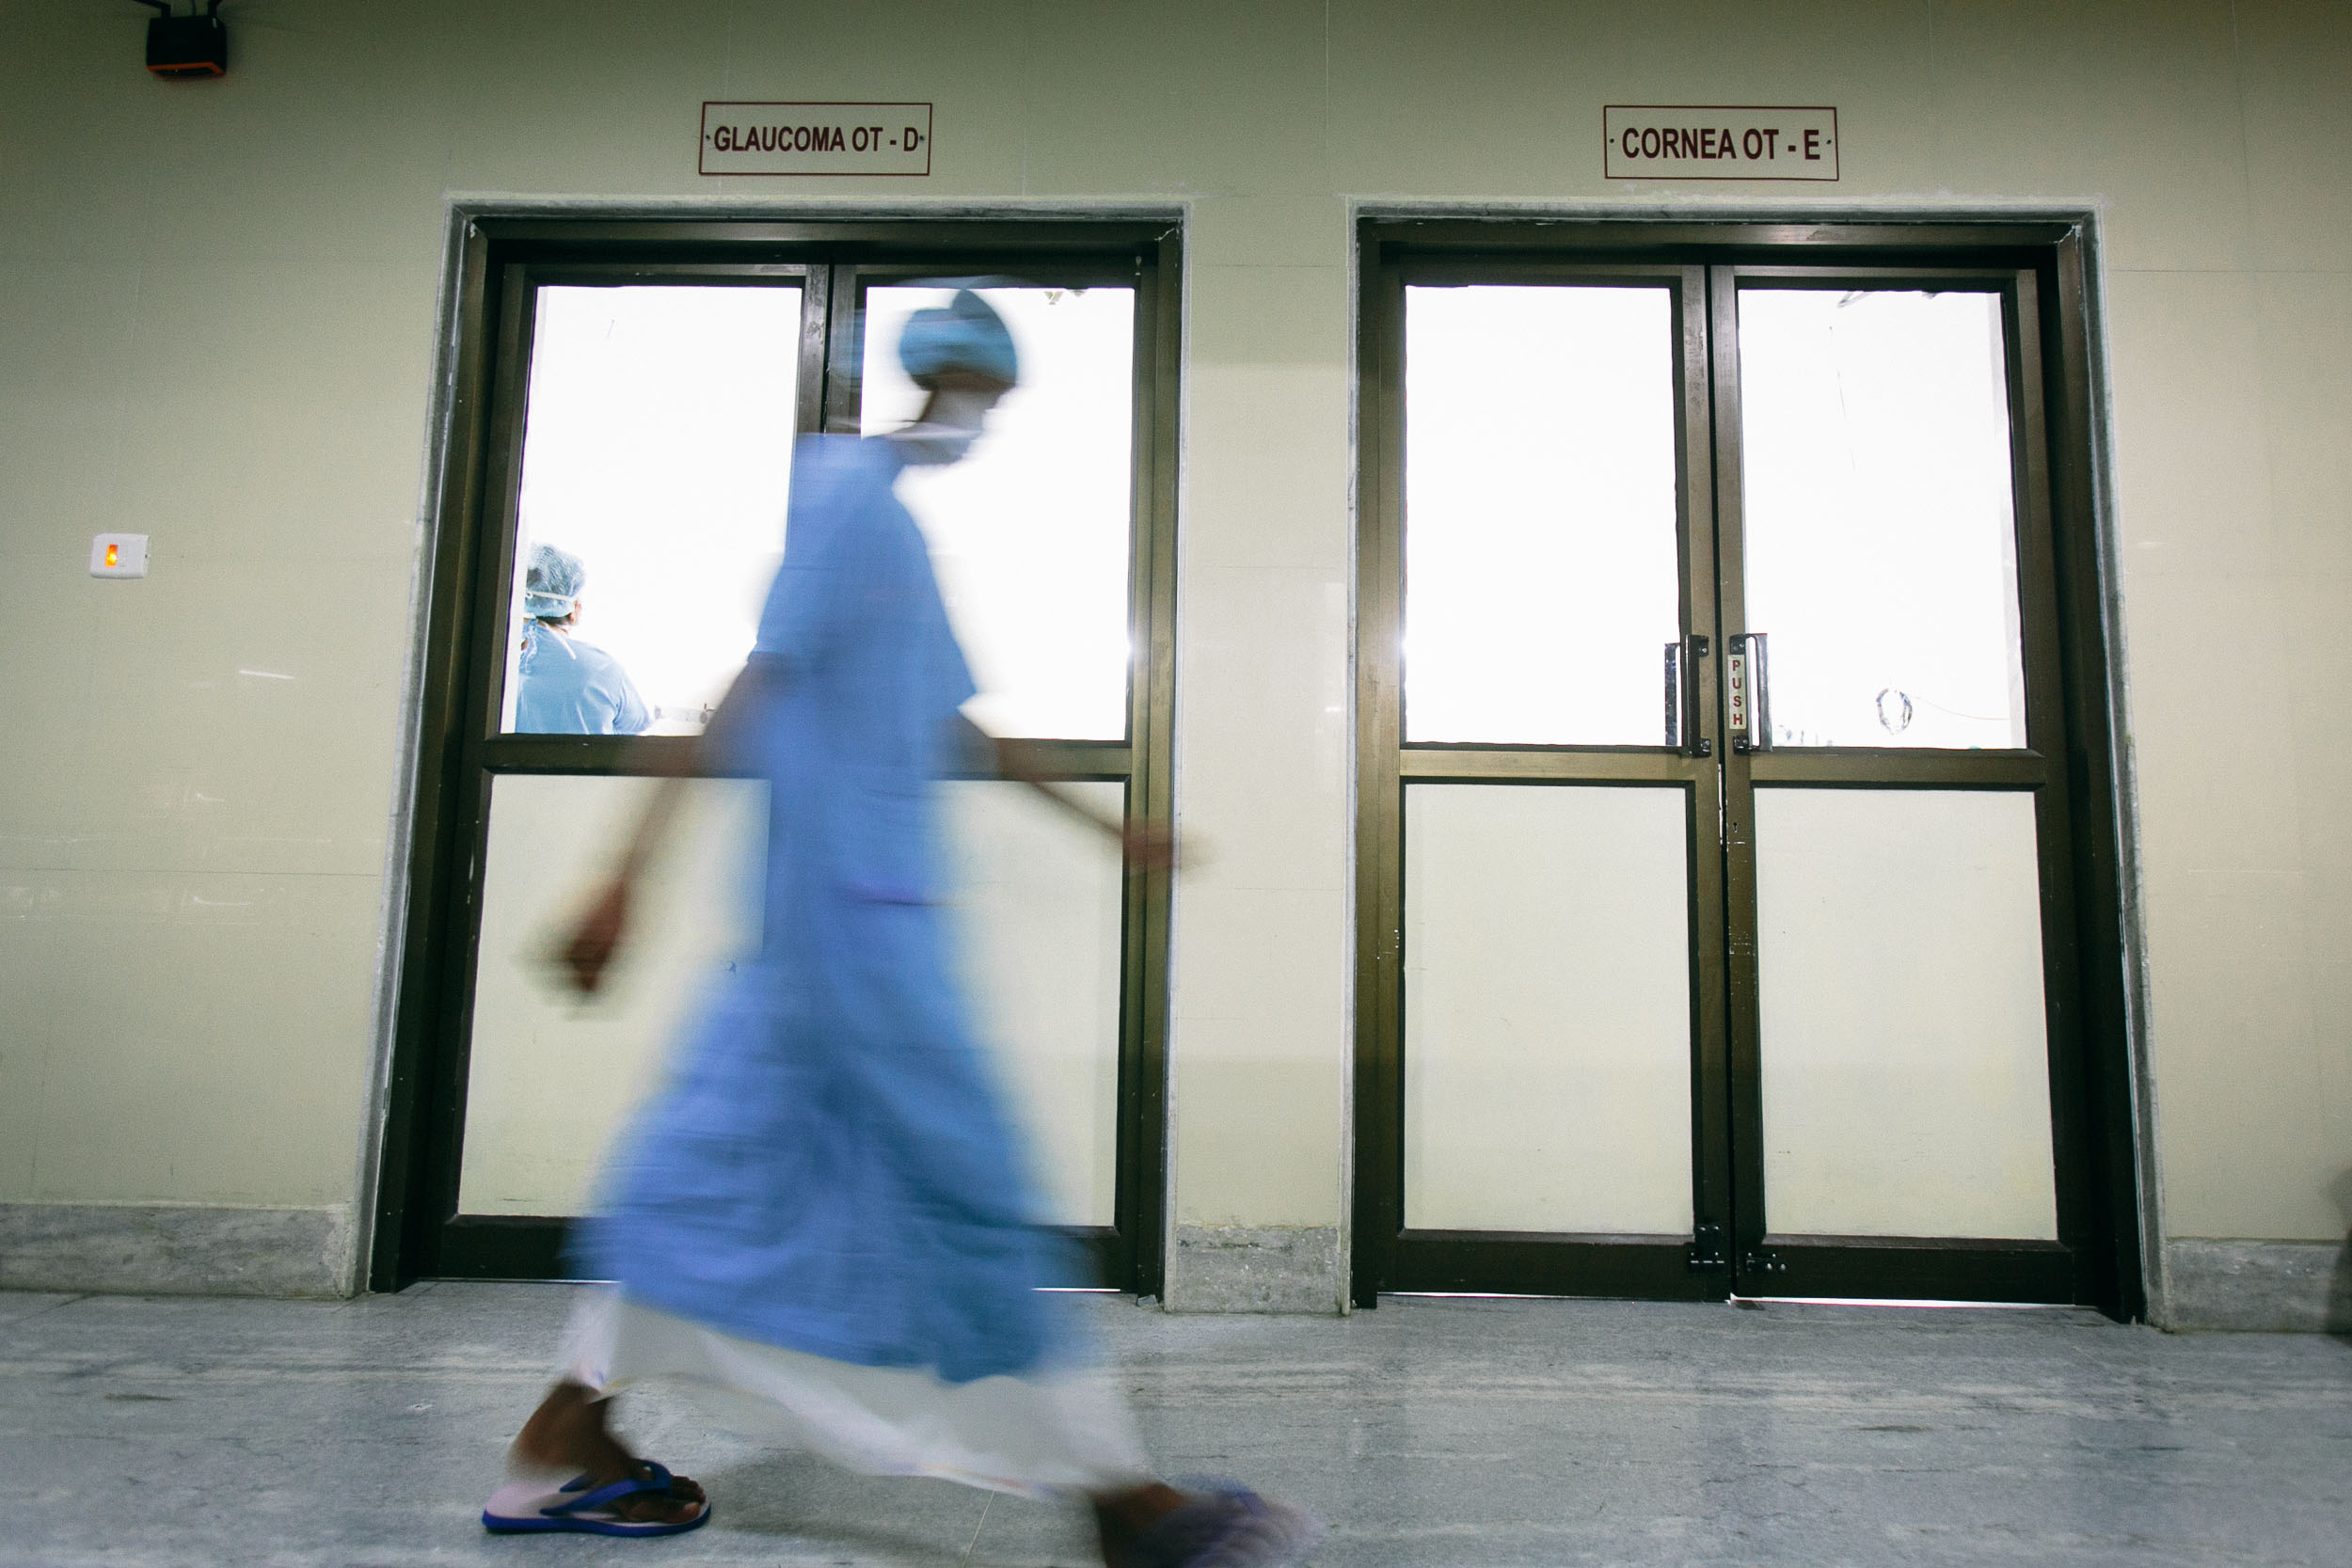 brian-callaway-india-photography-aravind-eye-hospital-38.jpg